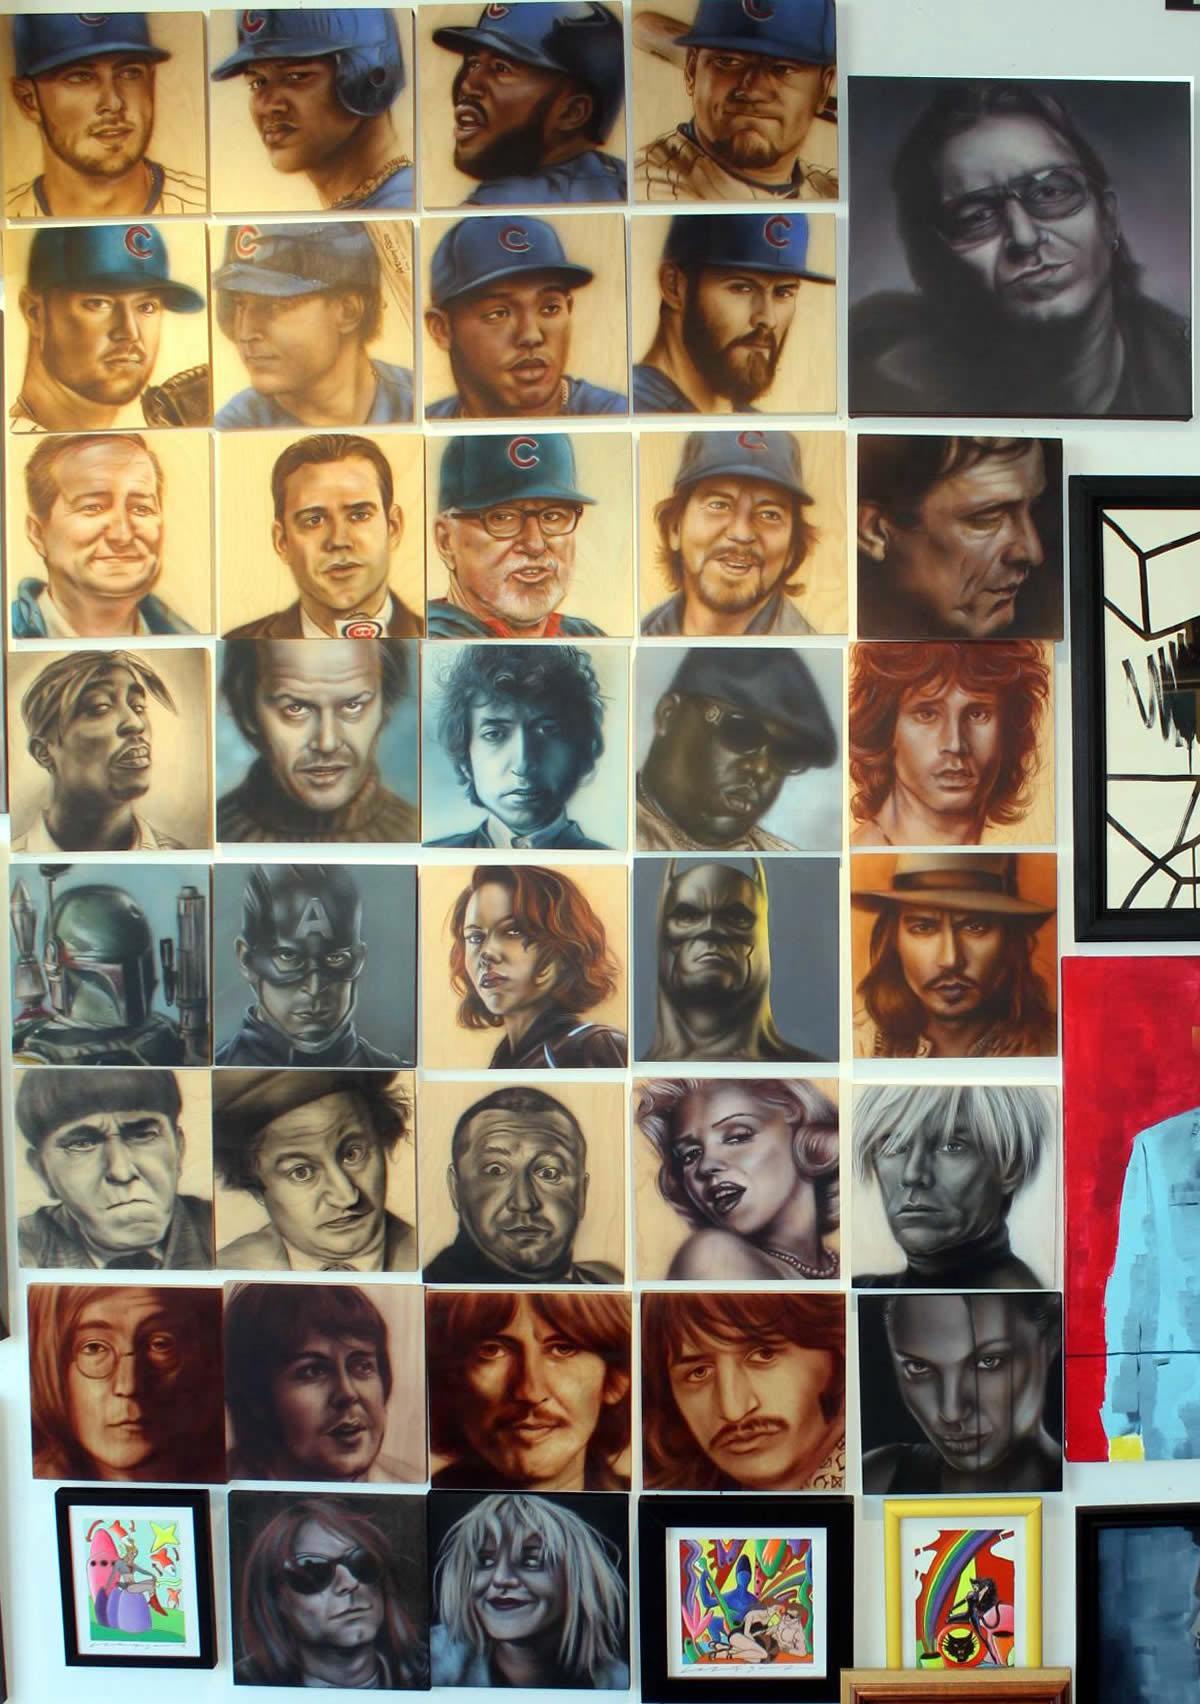 Ben Laskov original air brush portrait art wall at the david leonardis gallery